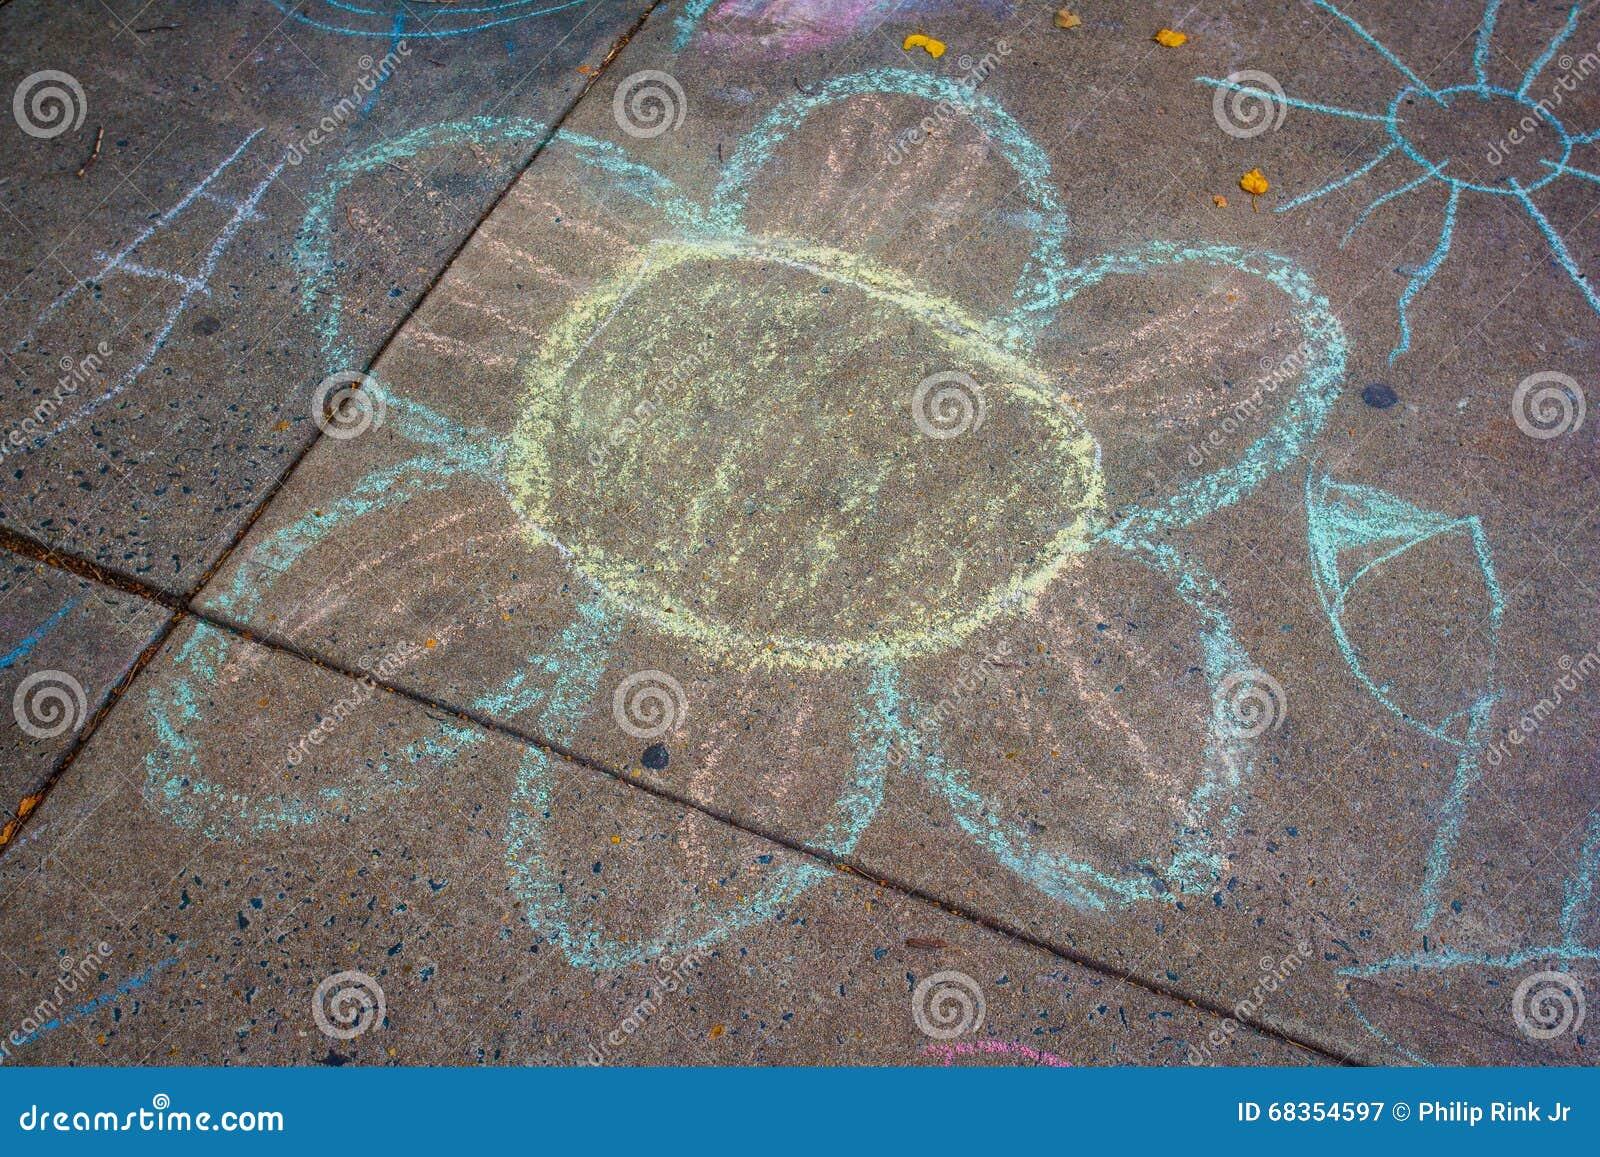 Flower Child Line Drawing : Best skunk drawings images skunks